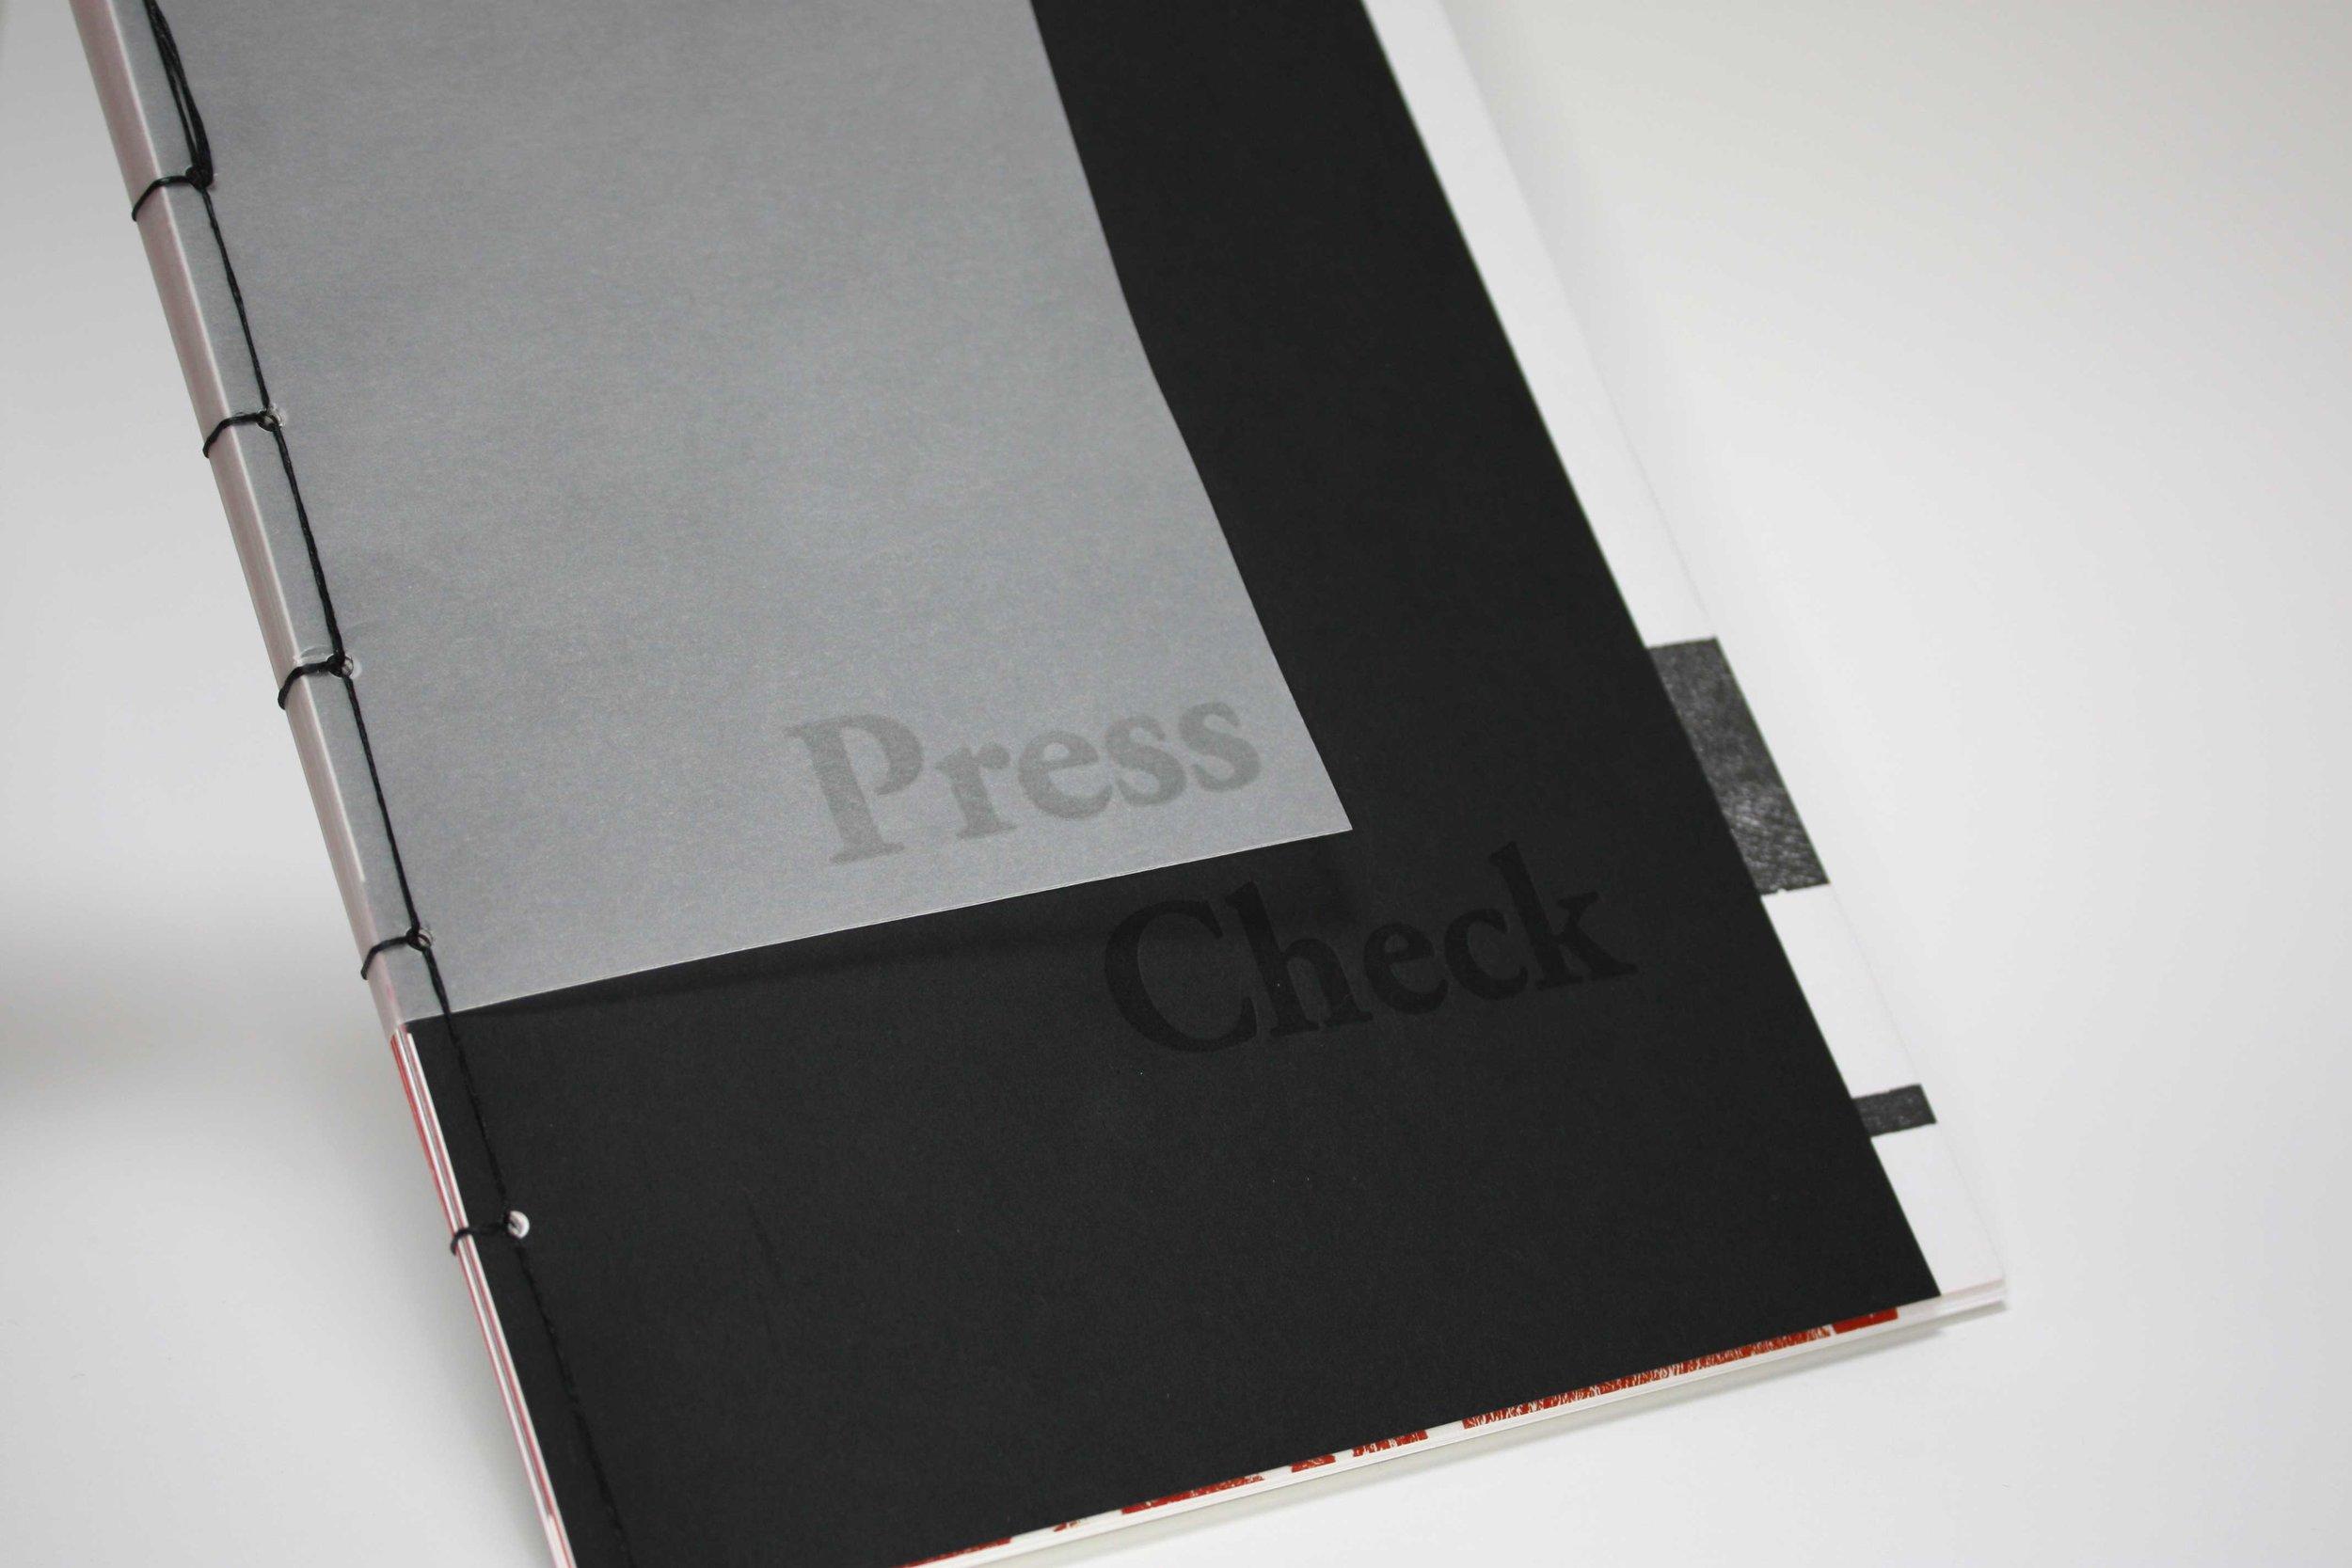 press_web6.jpg